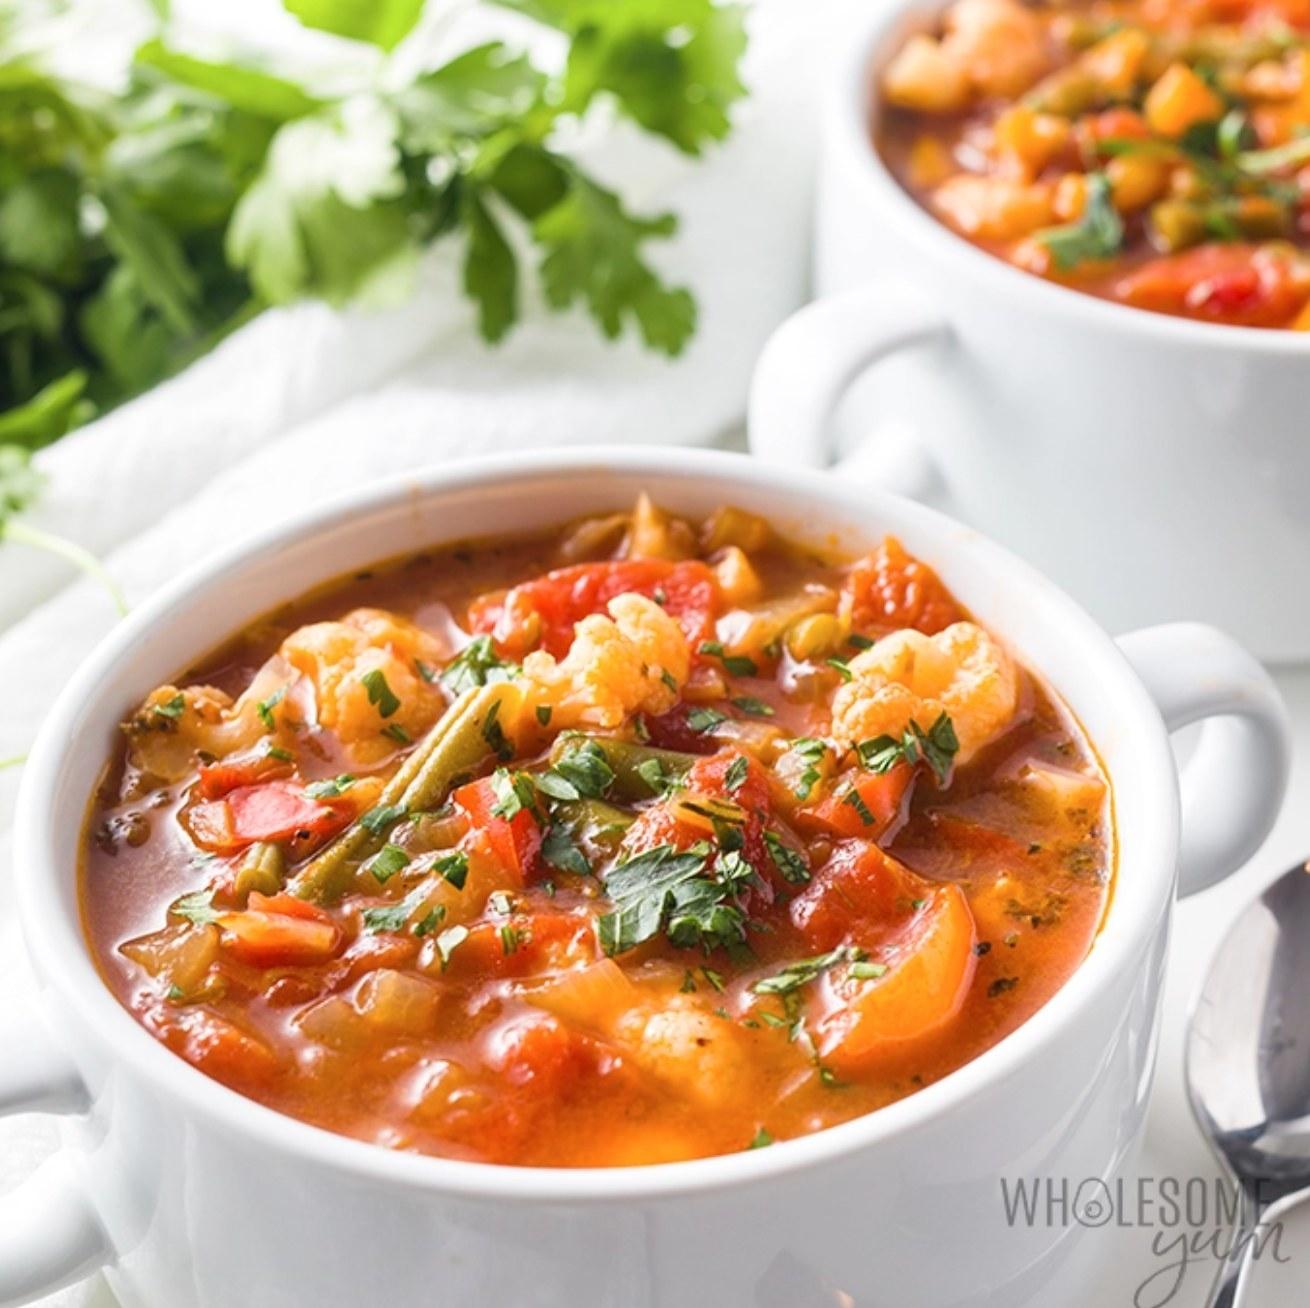 Keto low carb vegetable soup